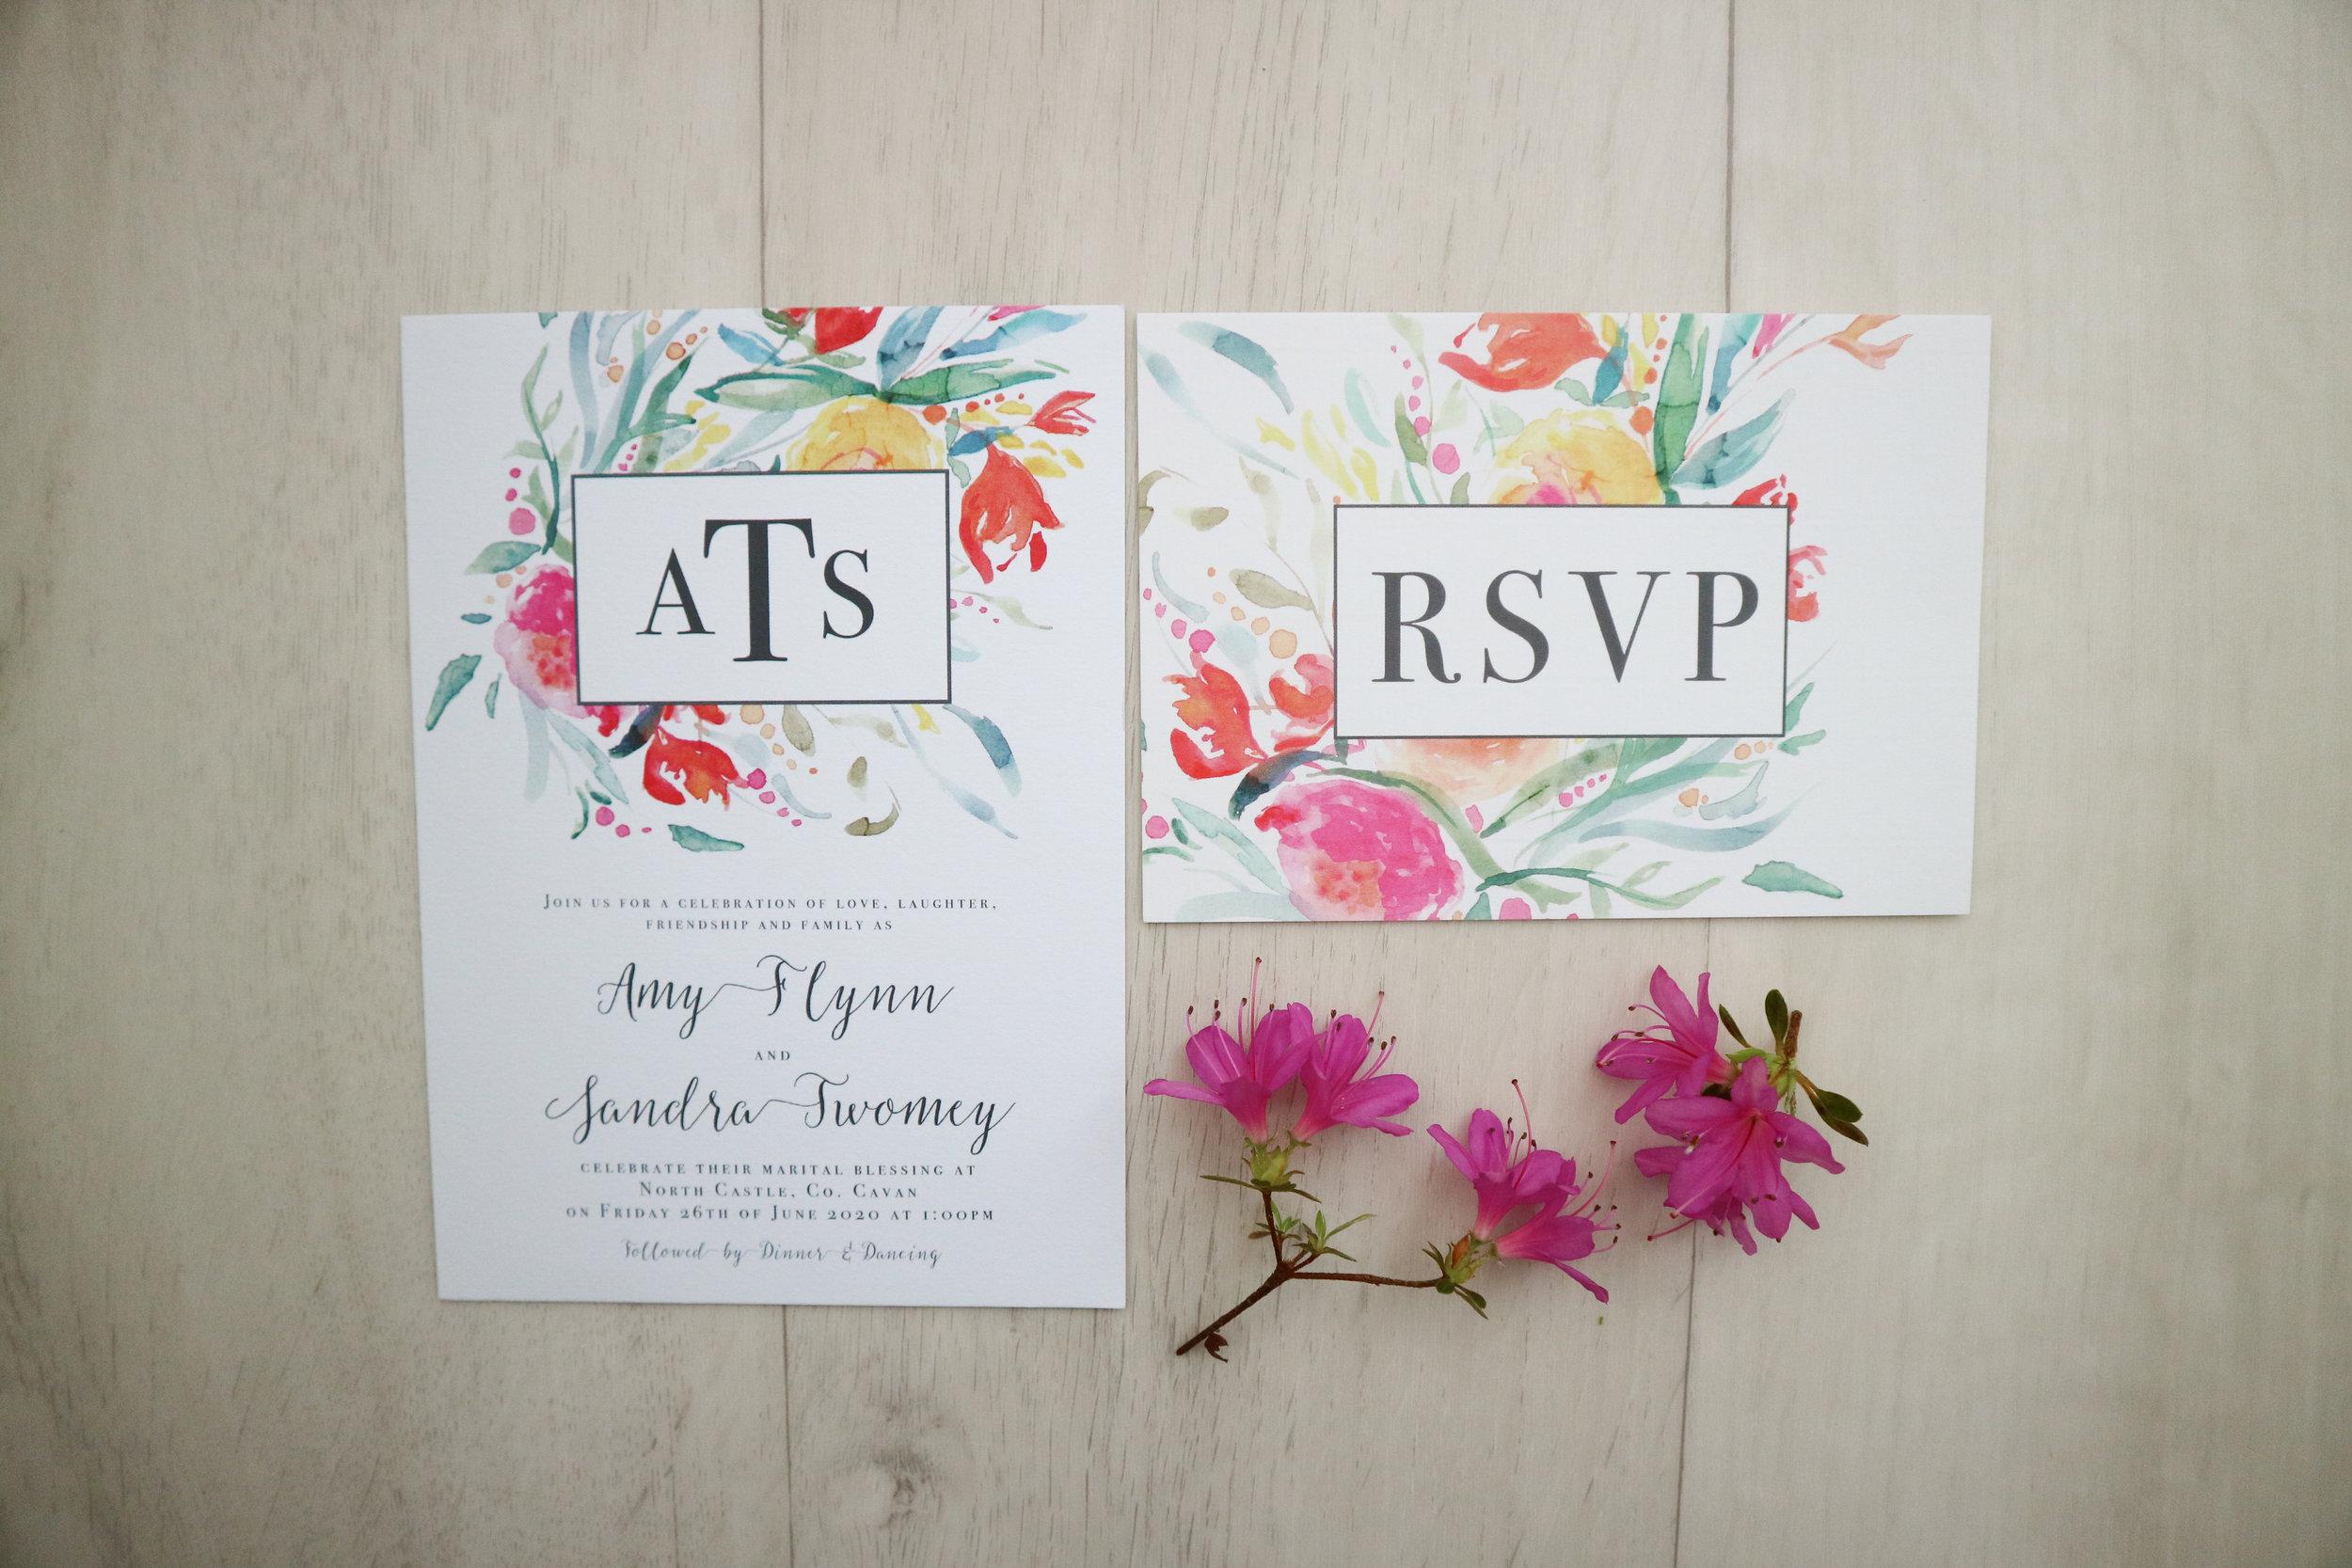 Little-Bow-Print-Wedding-Invitations-Waterford-Eden-photography-Boquet-Monogram-Confetti-15.jpg